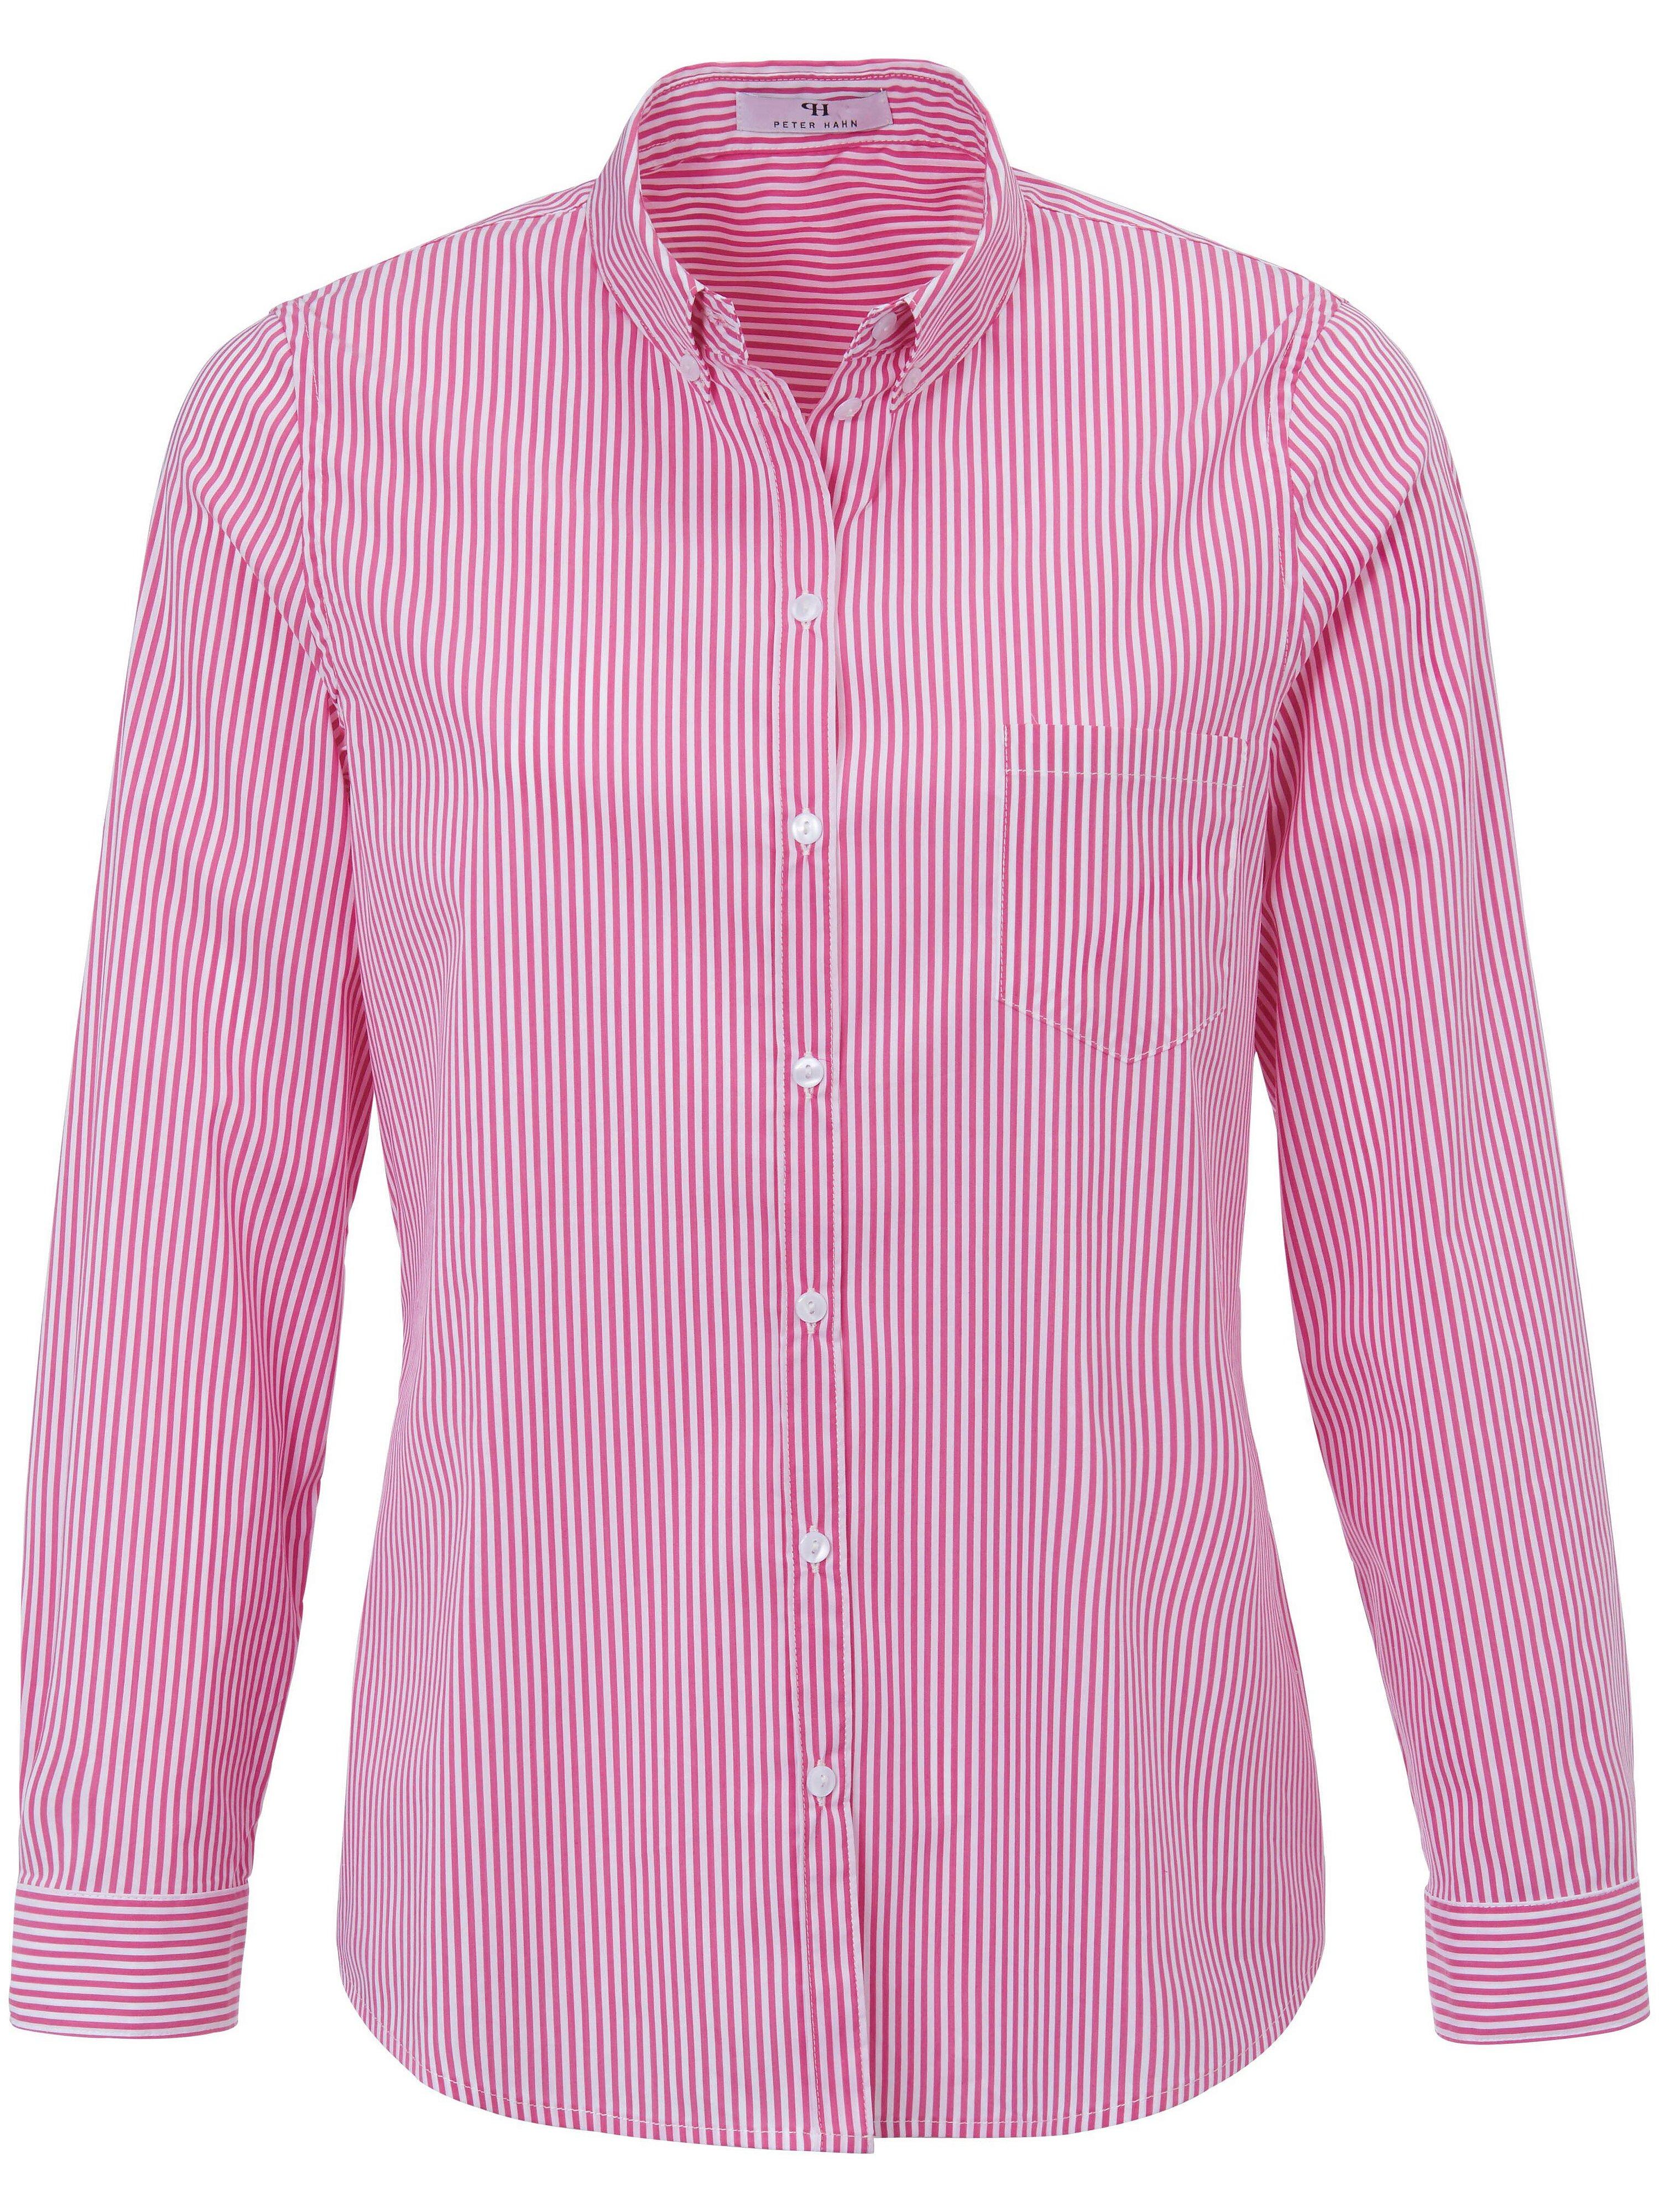 Blouse button-downkraag Van Peter Hahn roze